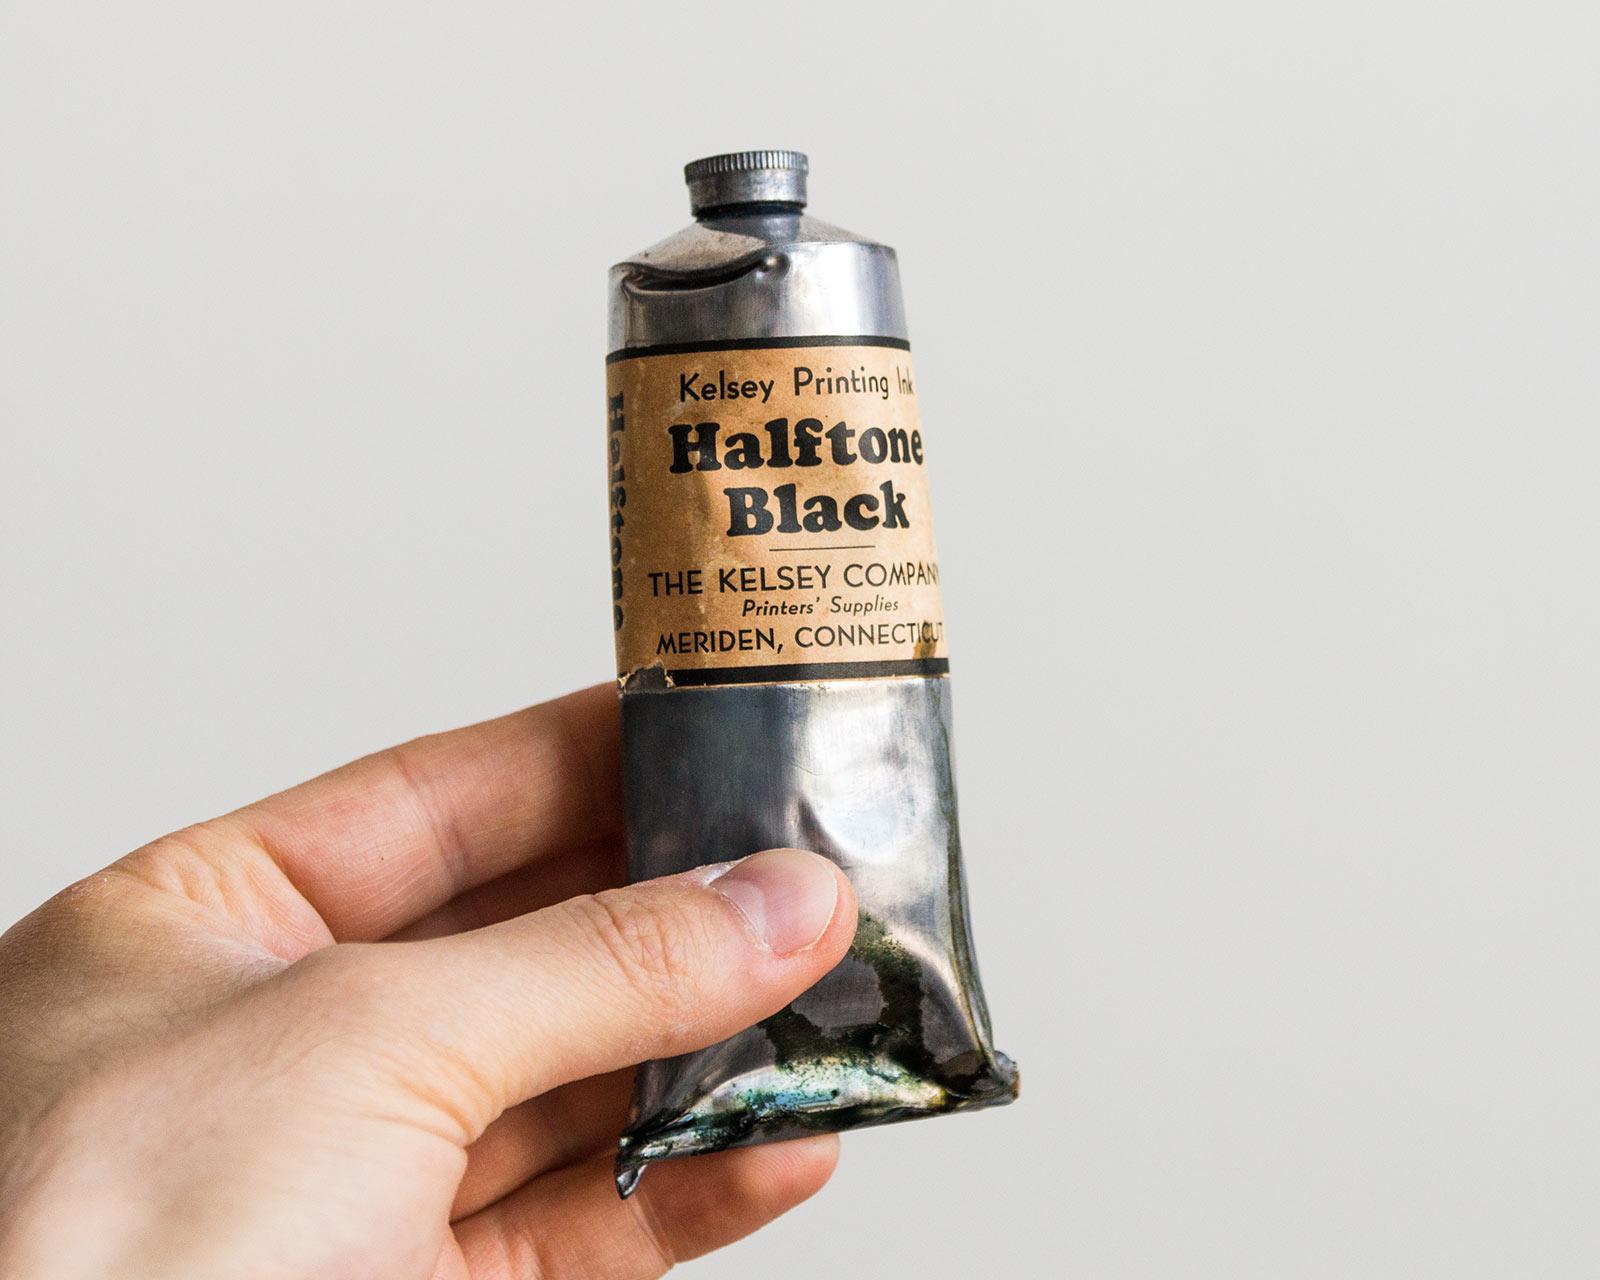 Kelsey letterpress printing halftone black ink tube